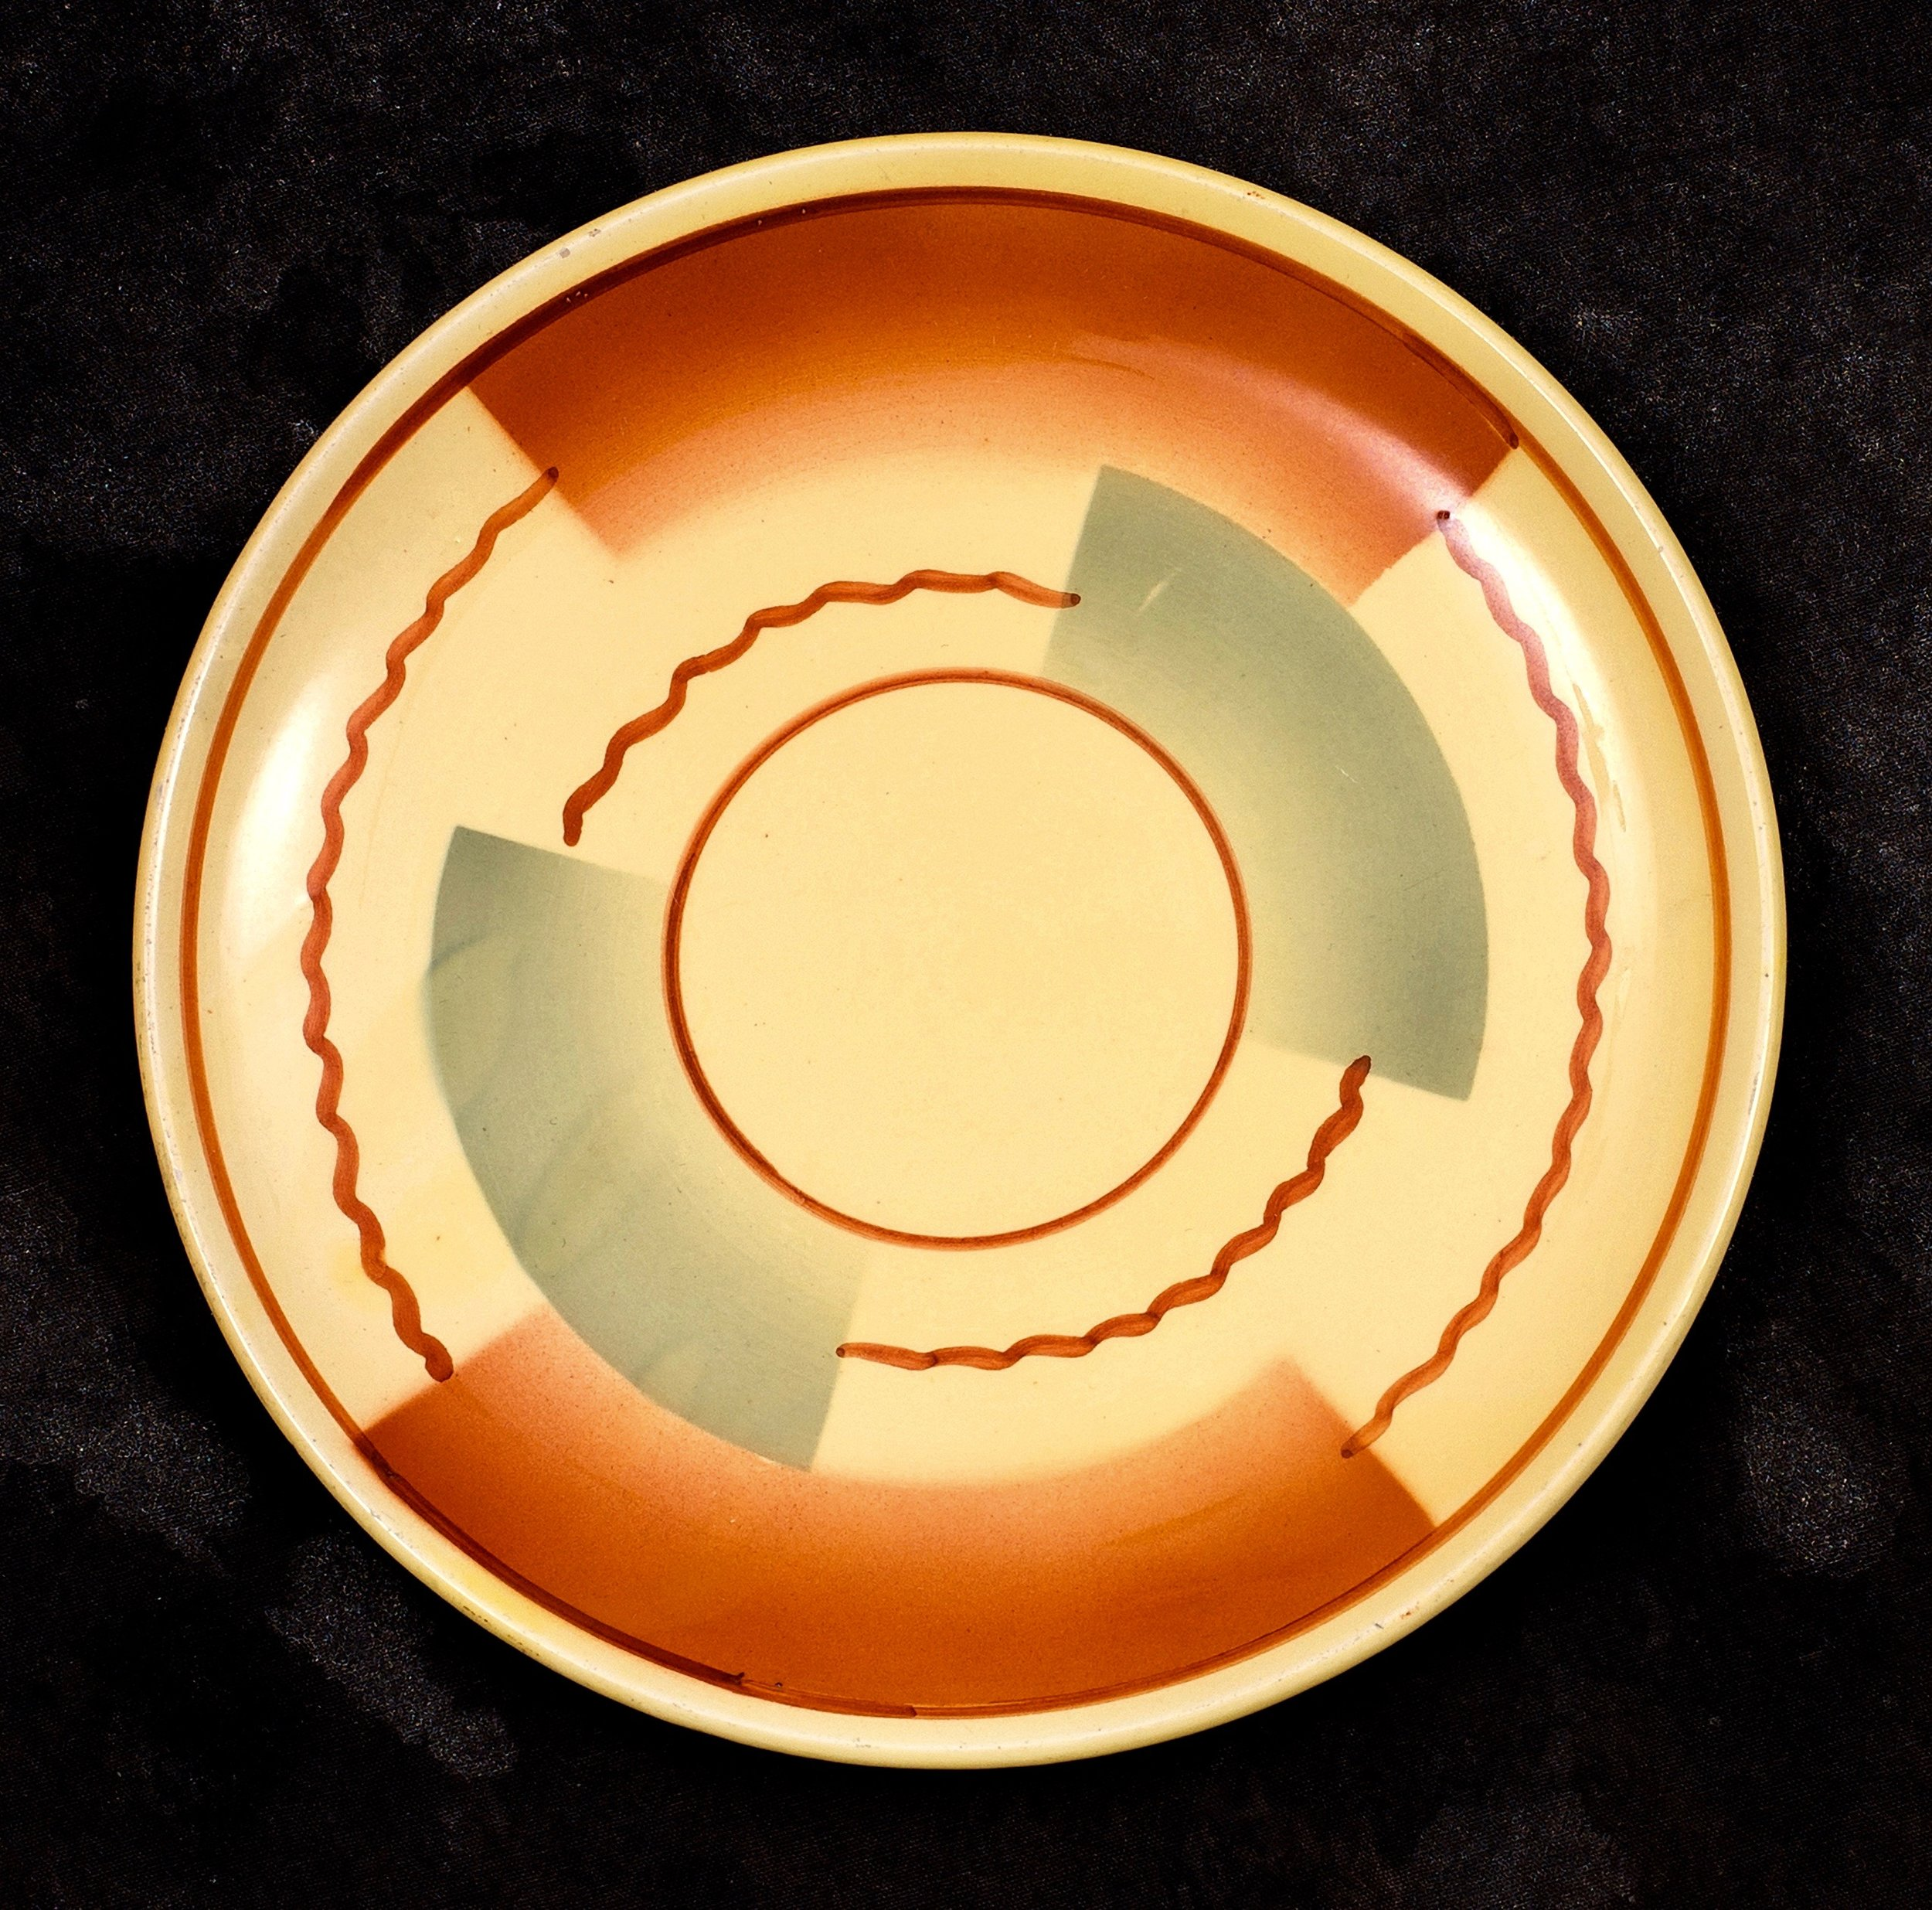 #28 Plate, dec.3574, Schramberg. Form and decoration by Eva Stricker Zeisel, ca.1929. Black mfr.; 2 cm H, 16.5 cm top, 8.5 cm base Ø. RM2560